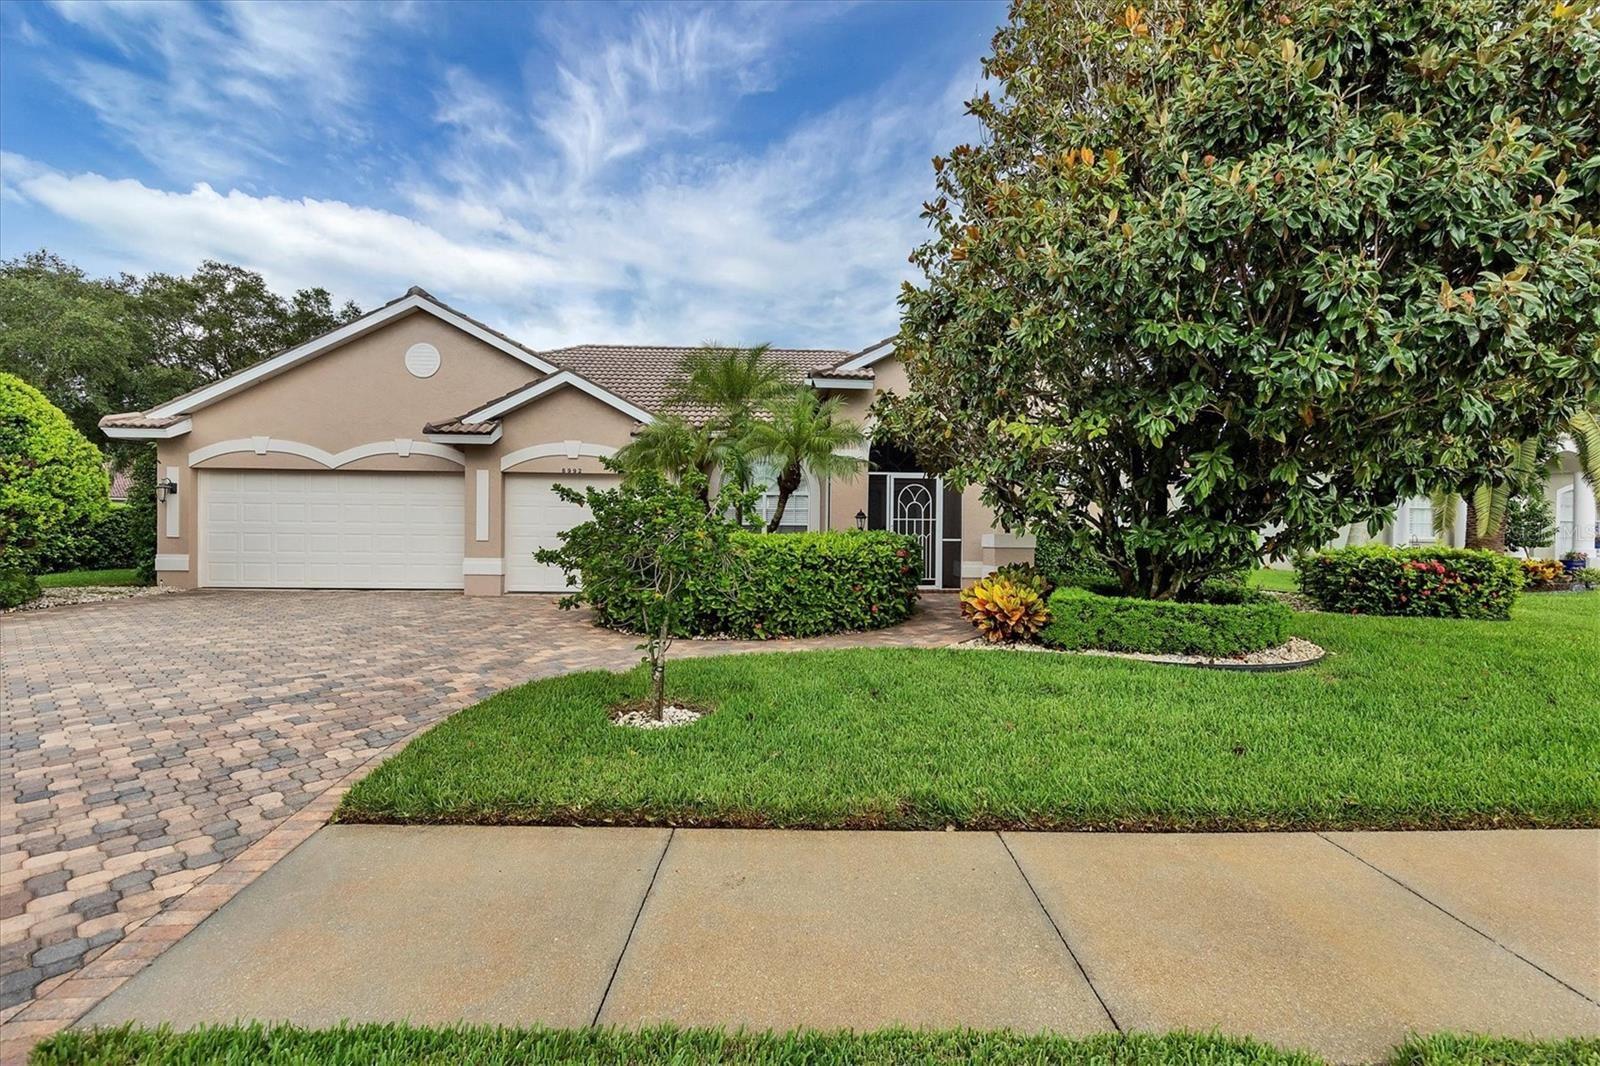 8992 GREY OAKS AVENUE, Sarasota, FL 34238 - #: A4512200